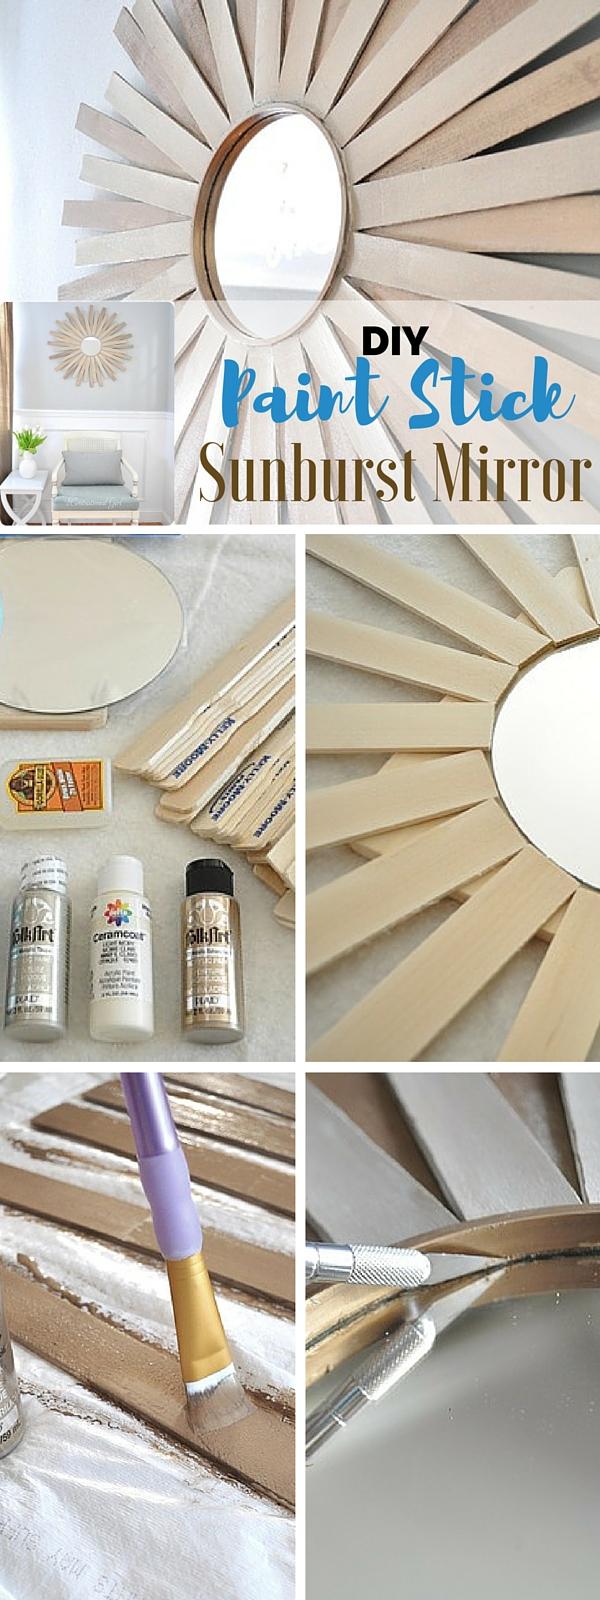 5.DIY Paintstick Sunburst Mirror